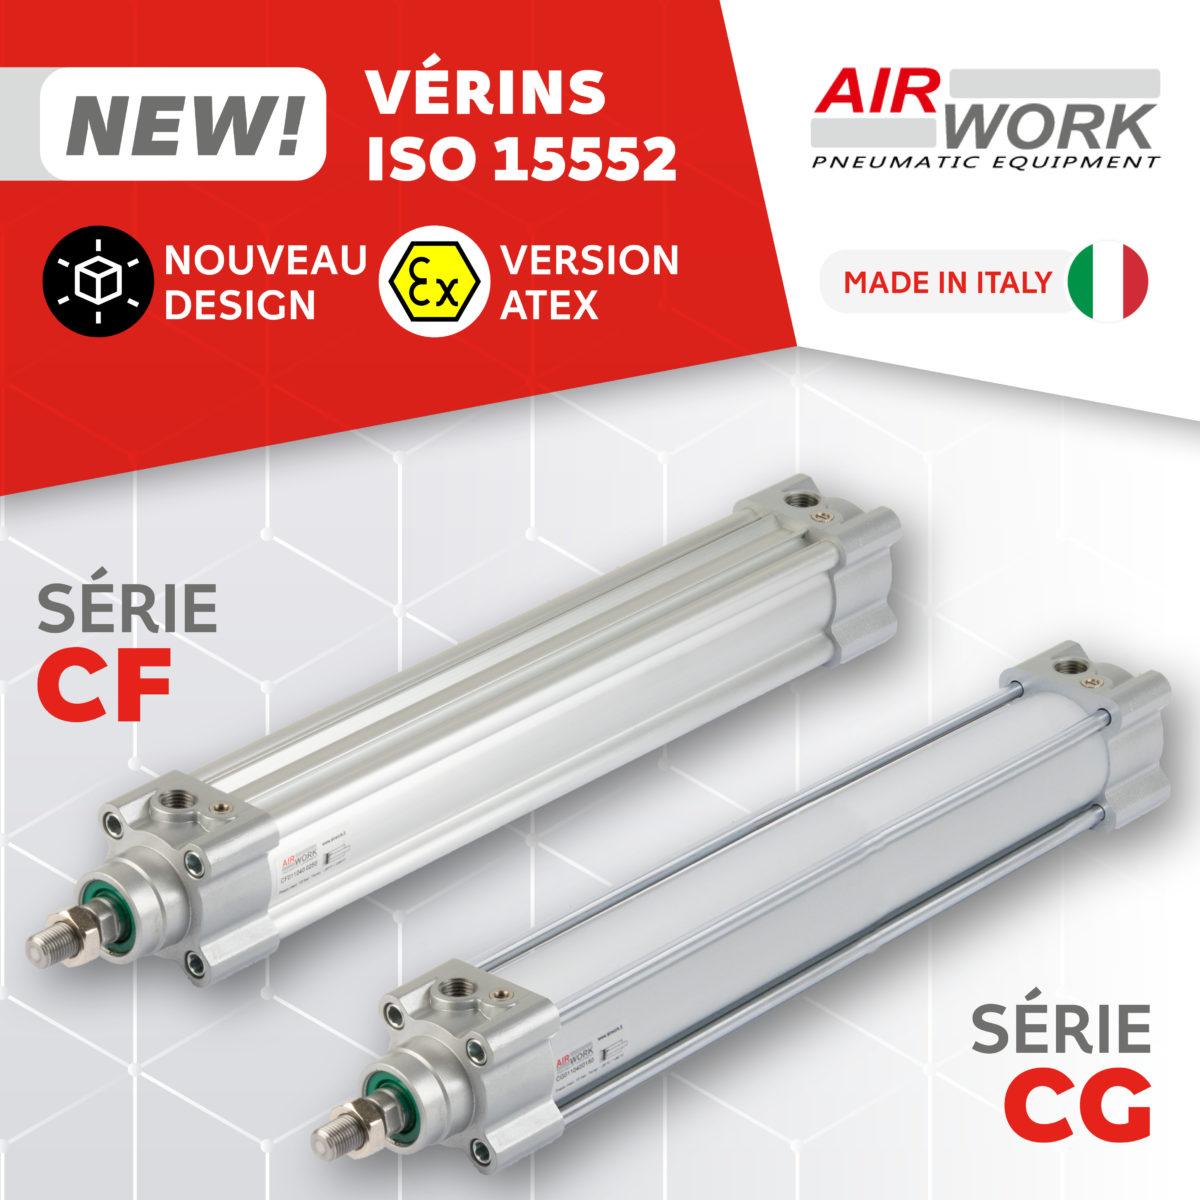 CF CG vérins pneumatiques ISO 15552 Airwork